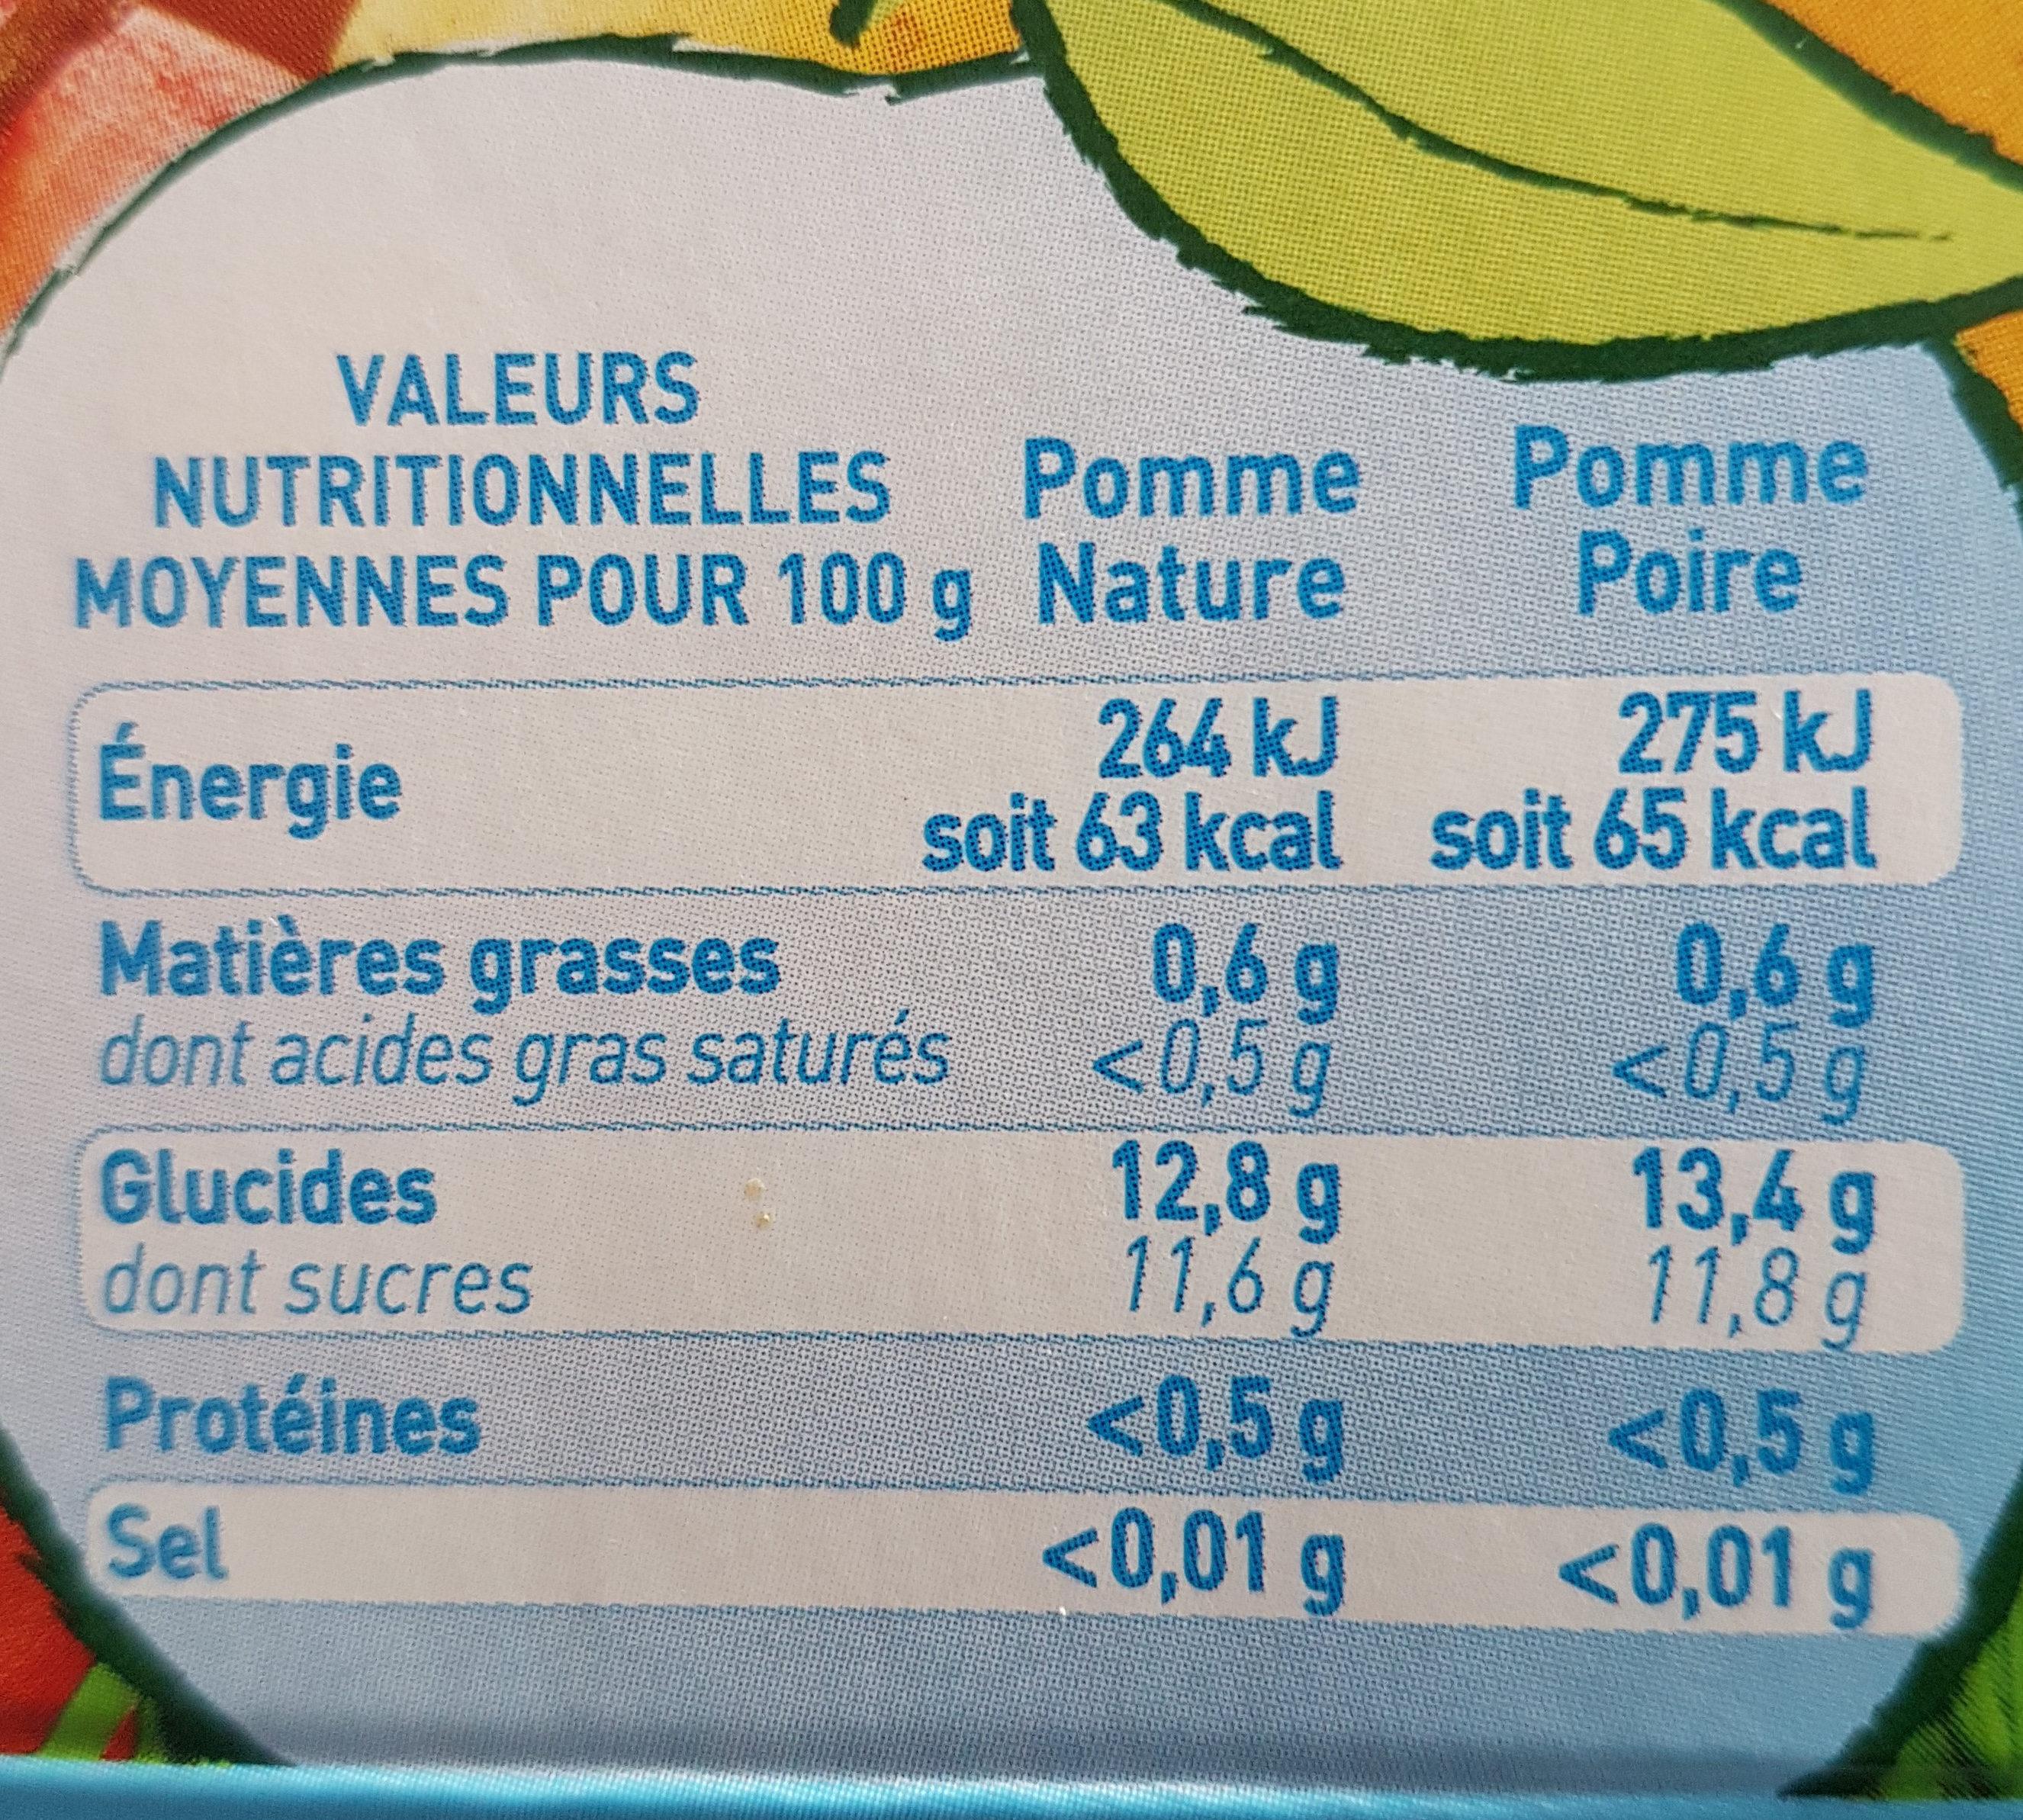 Pom'potes ssa 8 pom & 8 pomme poire 16 x 90 g. format familial - Nutrition facts